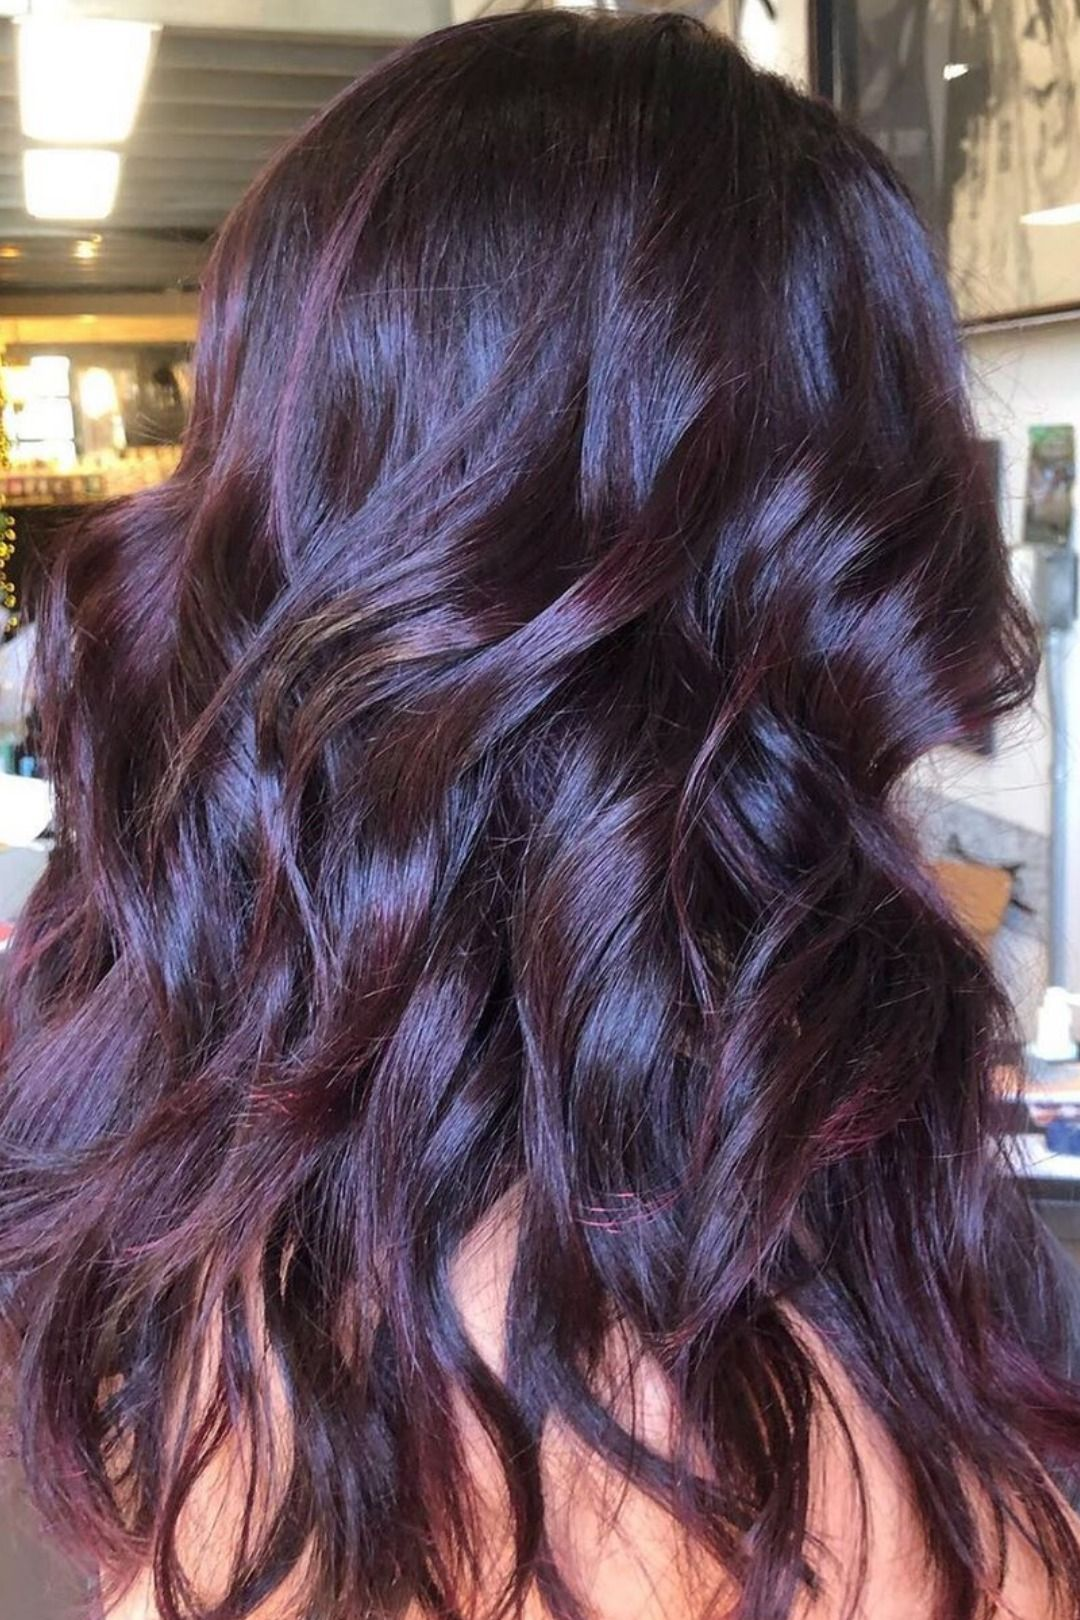 Extreme Purple Coloring Conditioner Overtone Haircare In 2020 Purple Brown Hair Dark Purple Hair Purple Hair